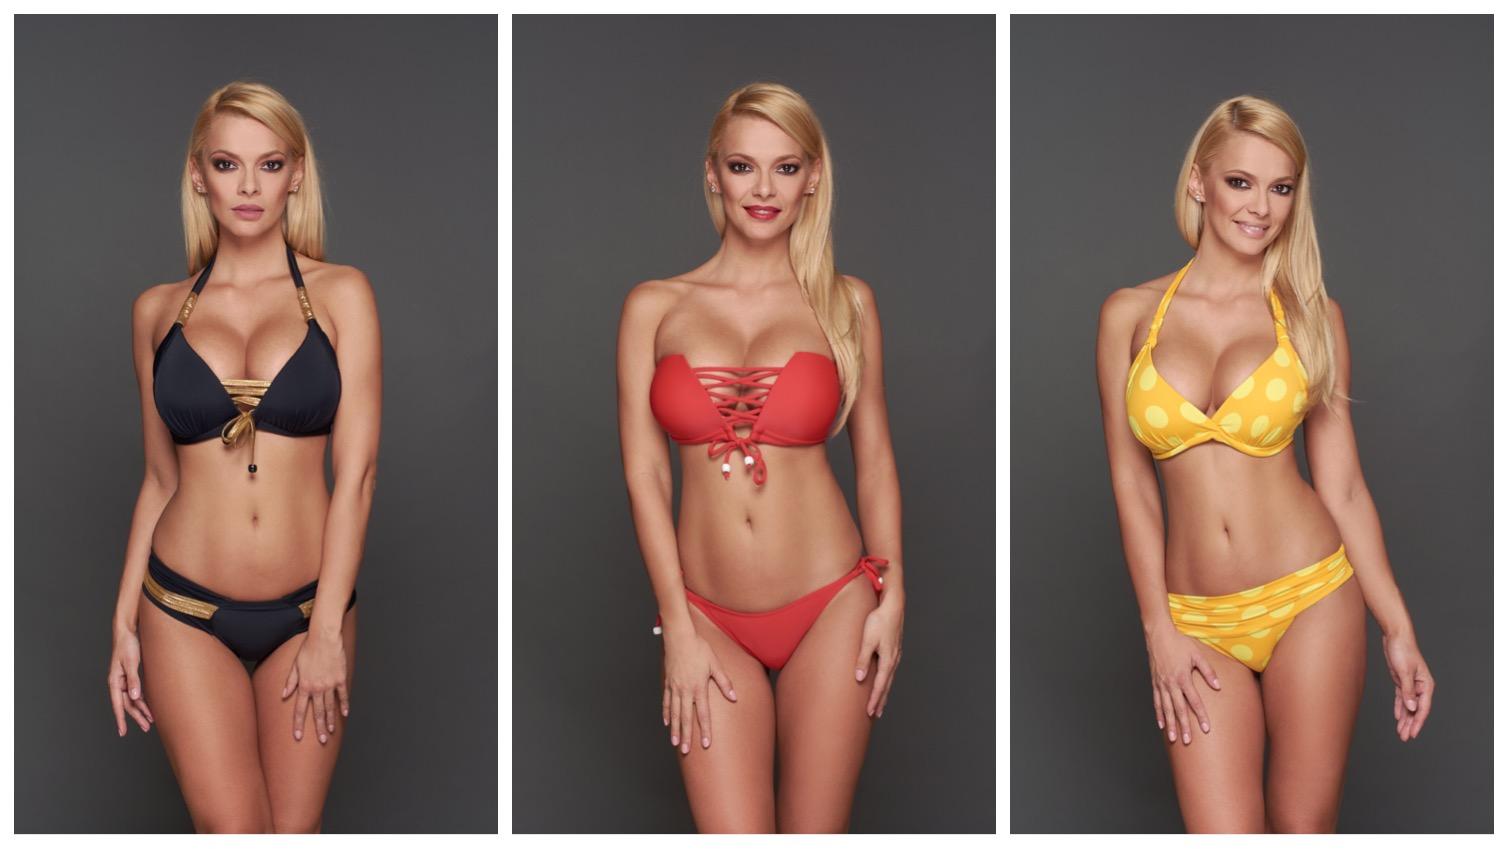 Pyramid bikini - Pyramid bikini webshop aa64789a62